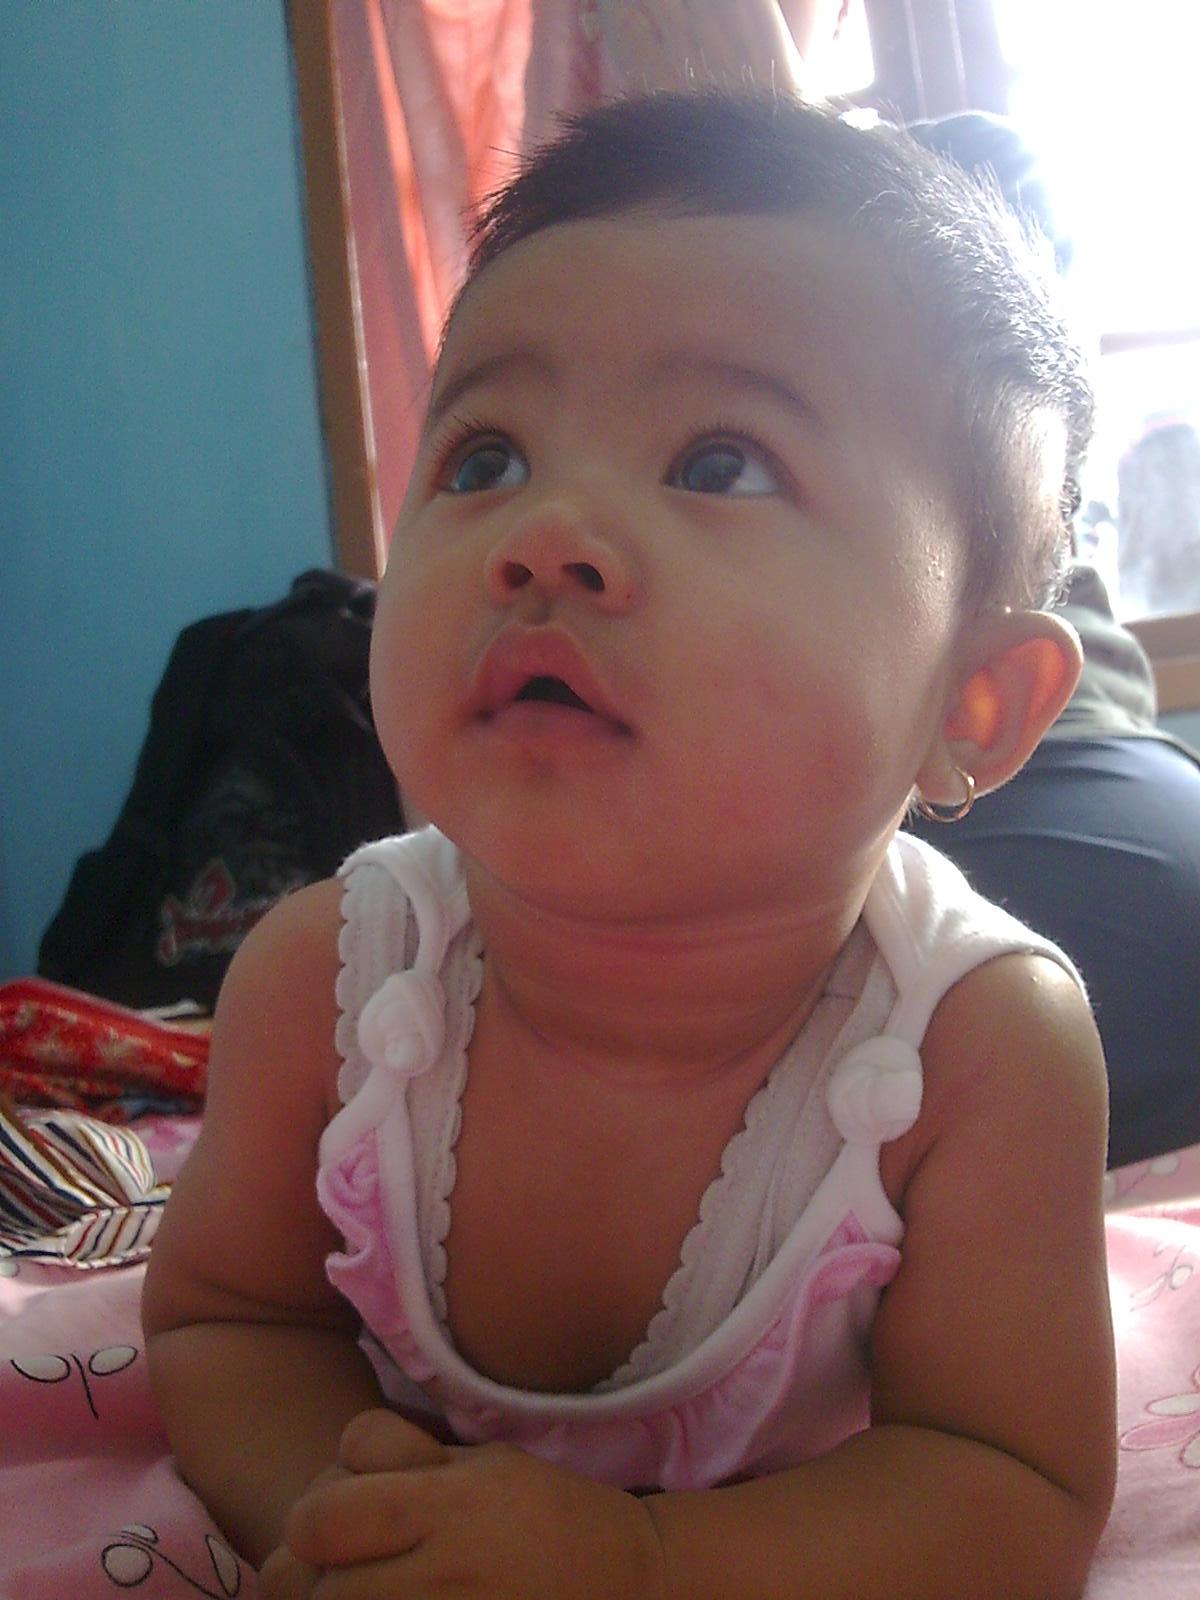 REFERENSI PENYAKIT 7 Cara Mendeteksi Gangguan Pertumbuhan Bayi